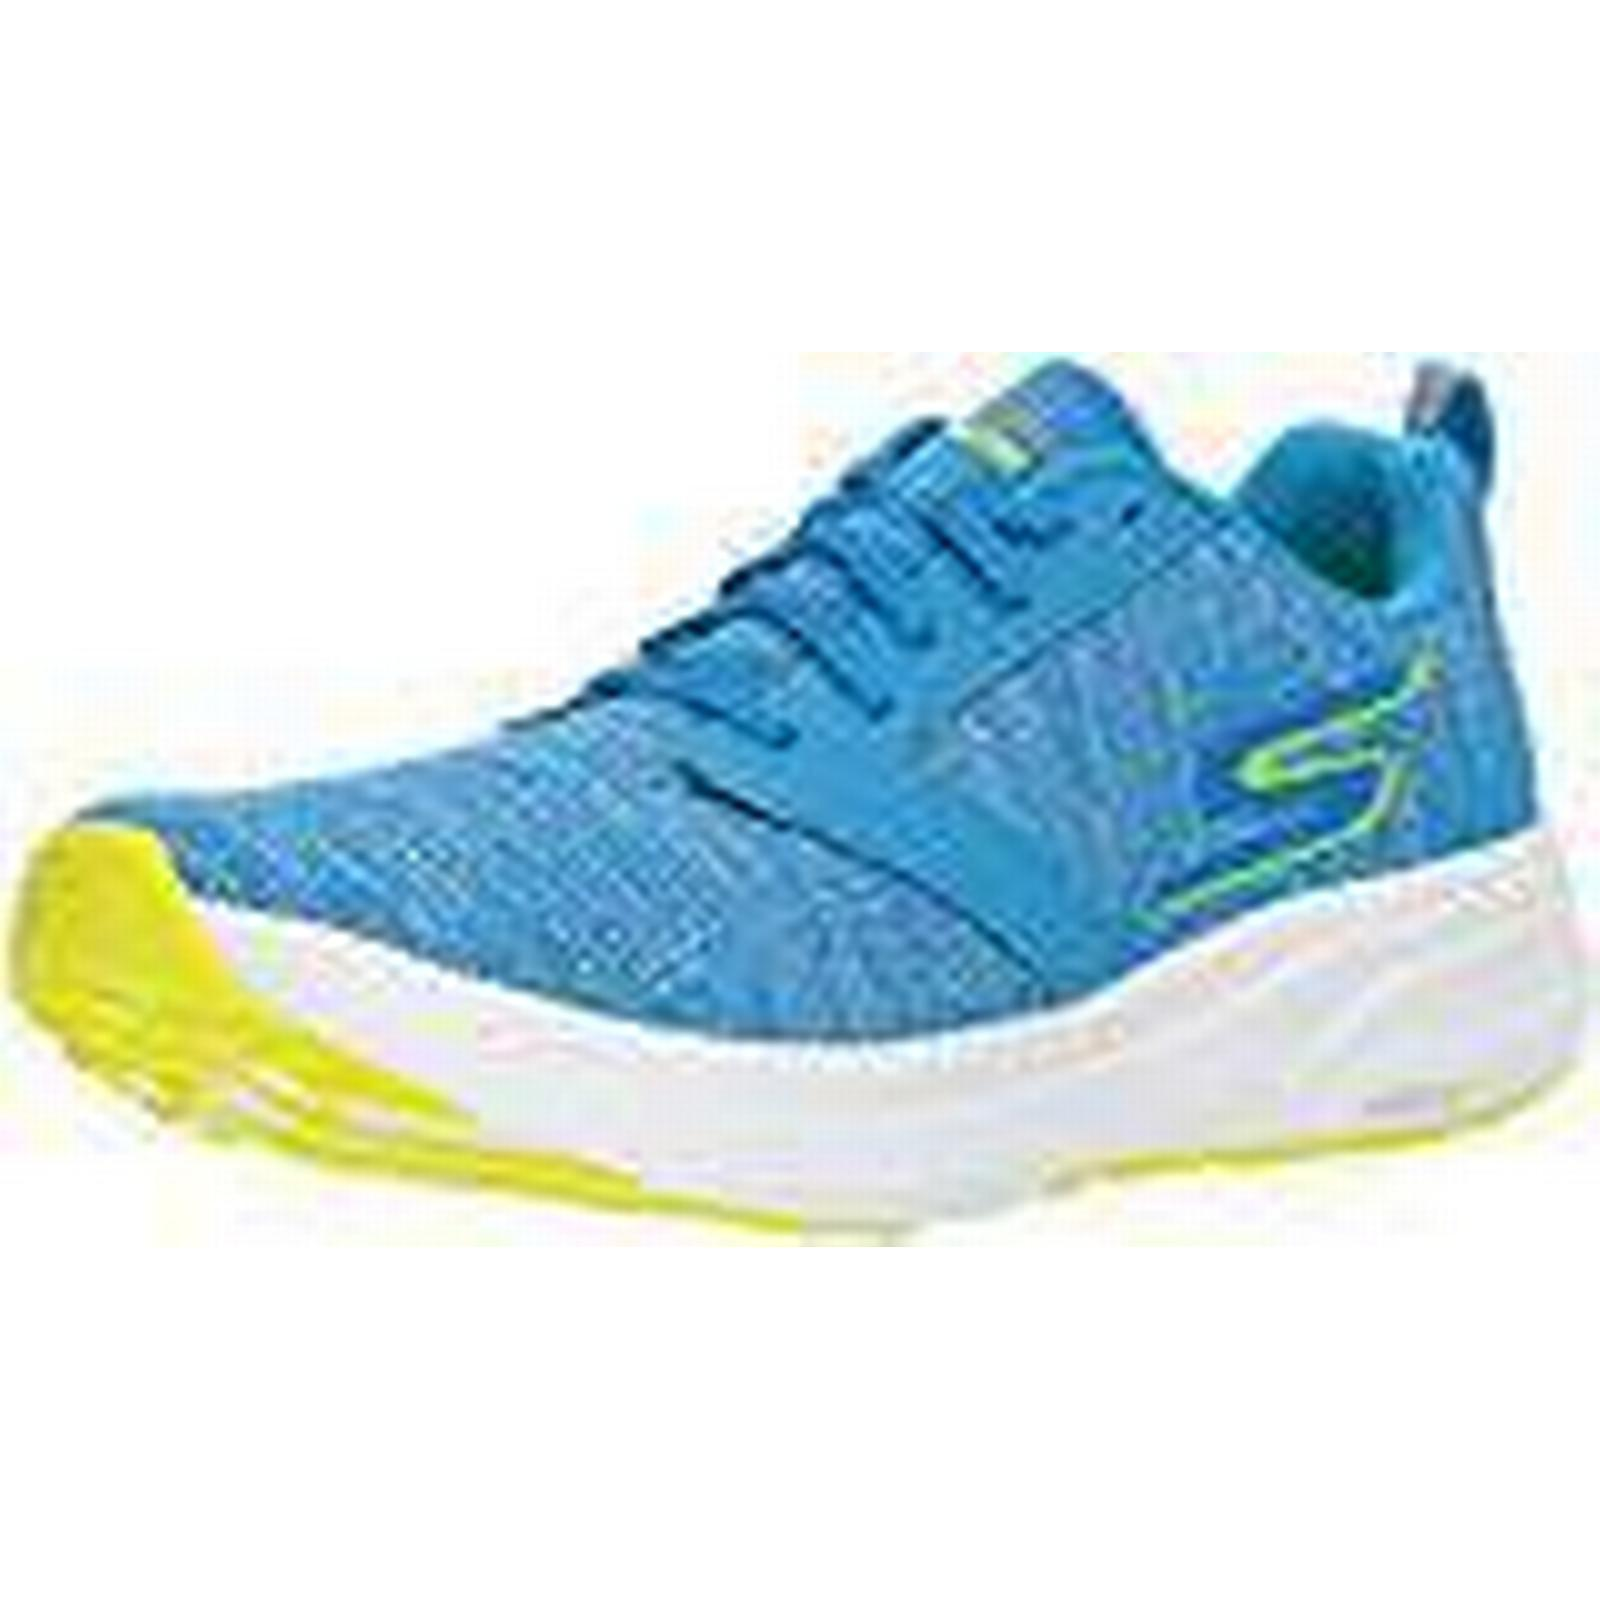 Skechers Men Go Run Ride (Blue) 7 Fitness Shoes Blue (Blue) Ride 11 UK 45.5 EU bbd4fe